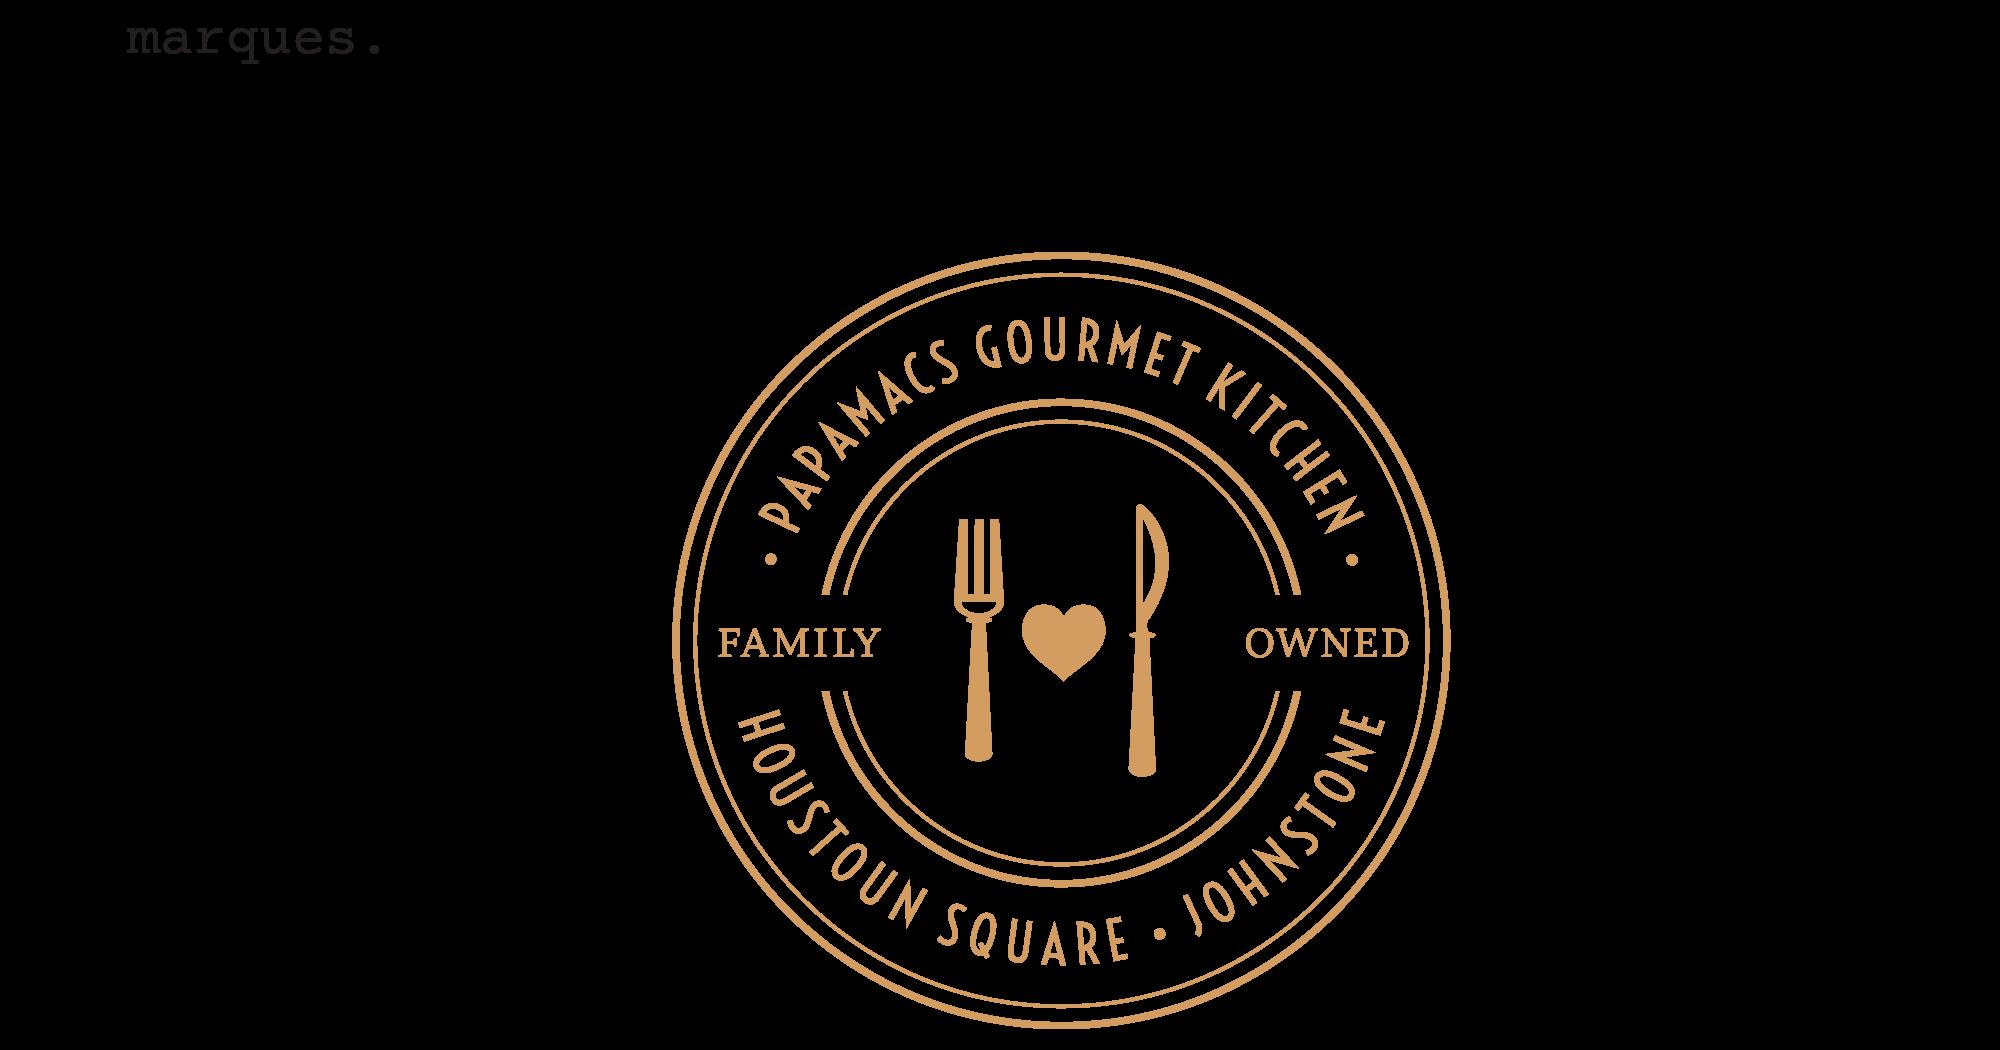 logo-marque-design-restaurant-papamacs-glasgow-johnstone